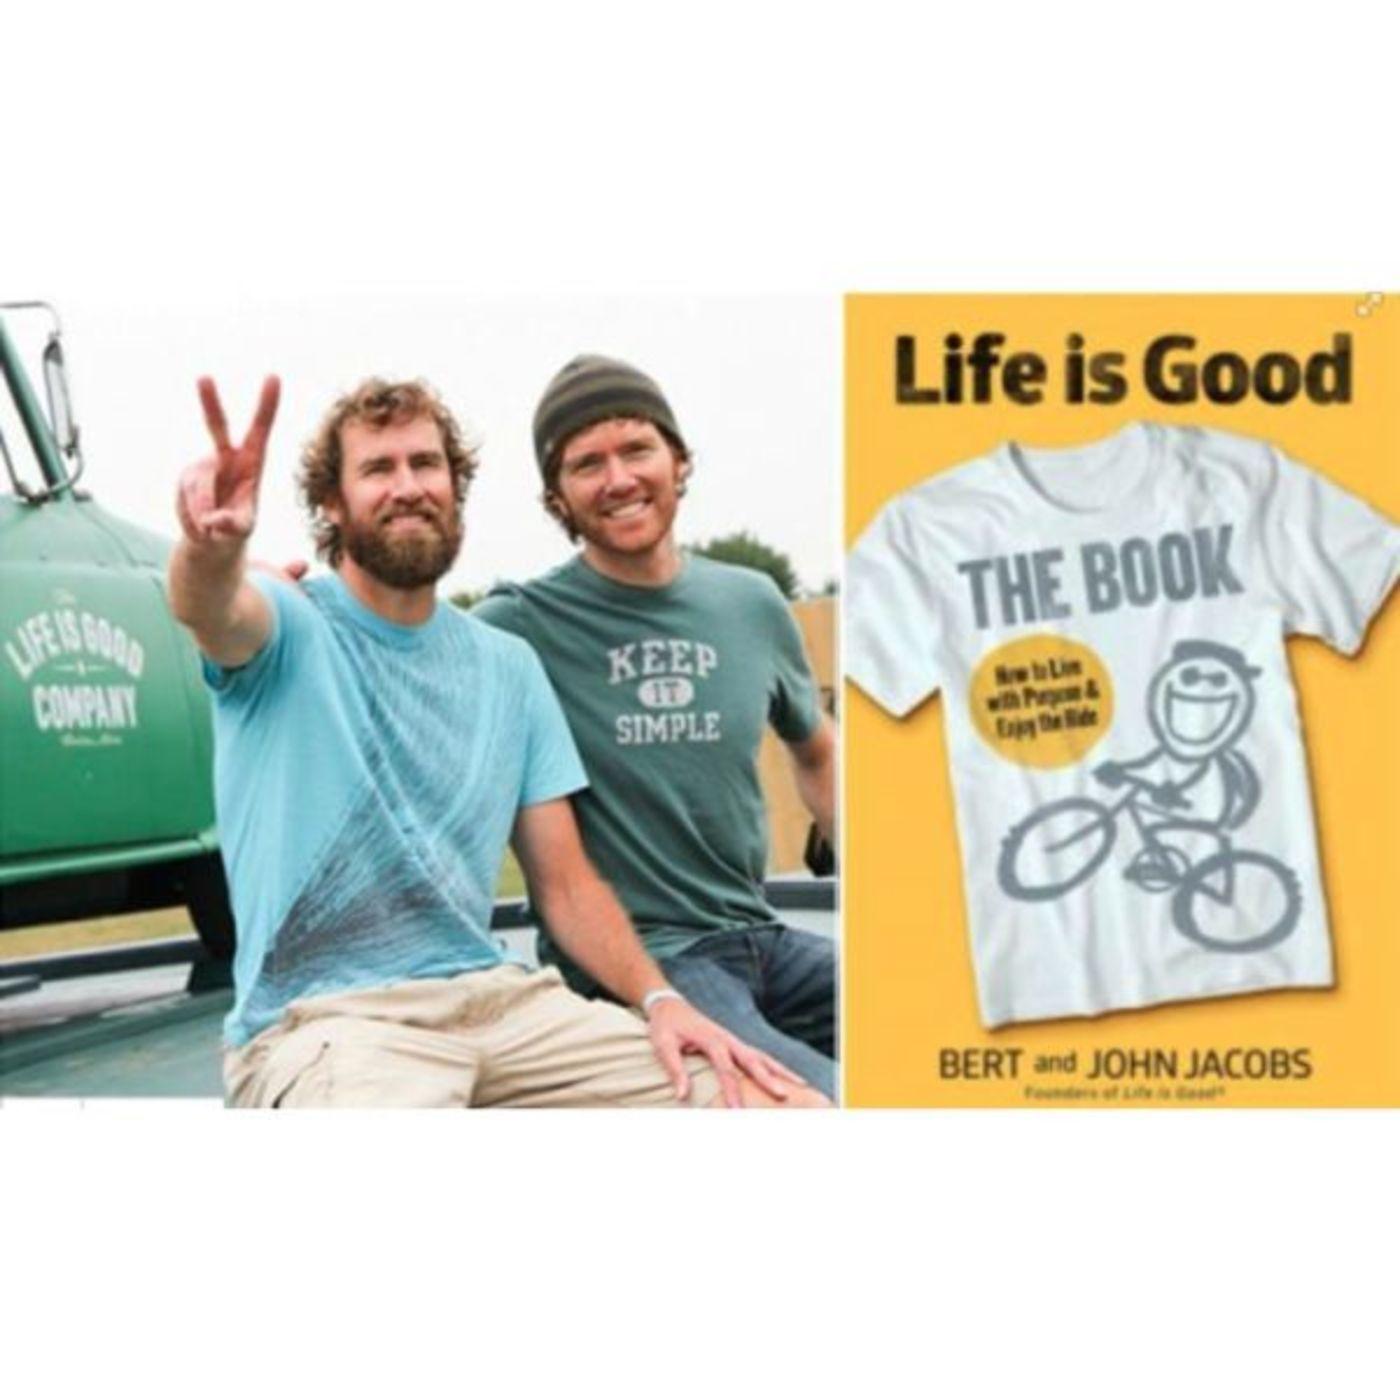 Bert & John Jacobs - Life is Good